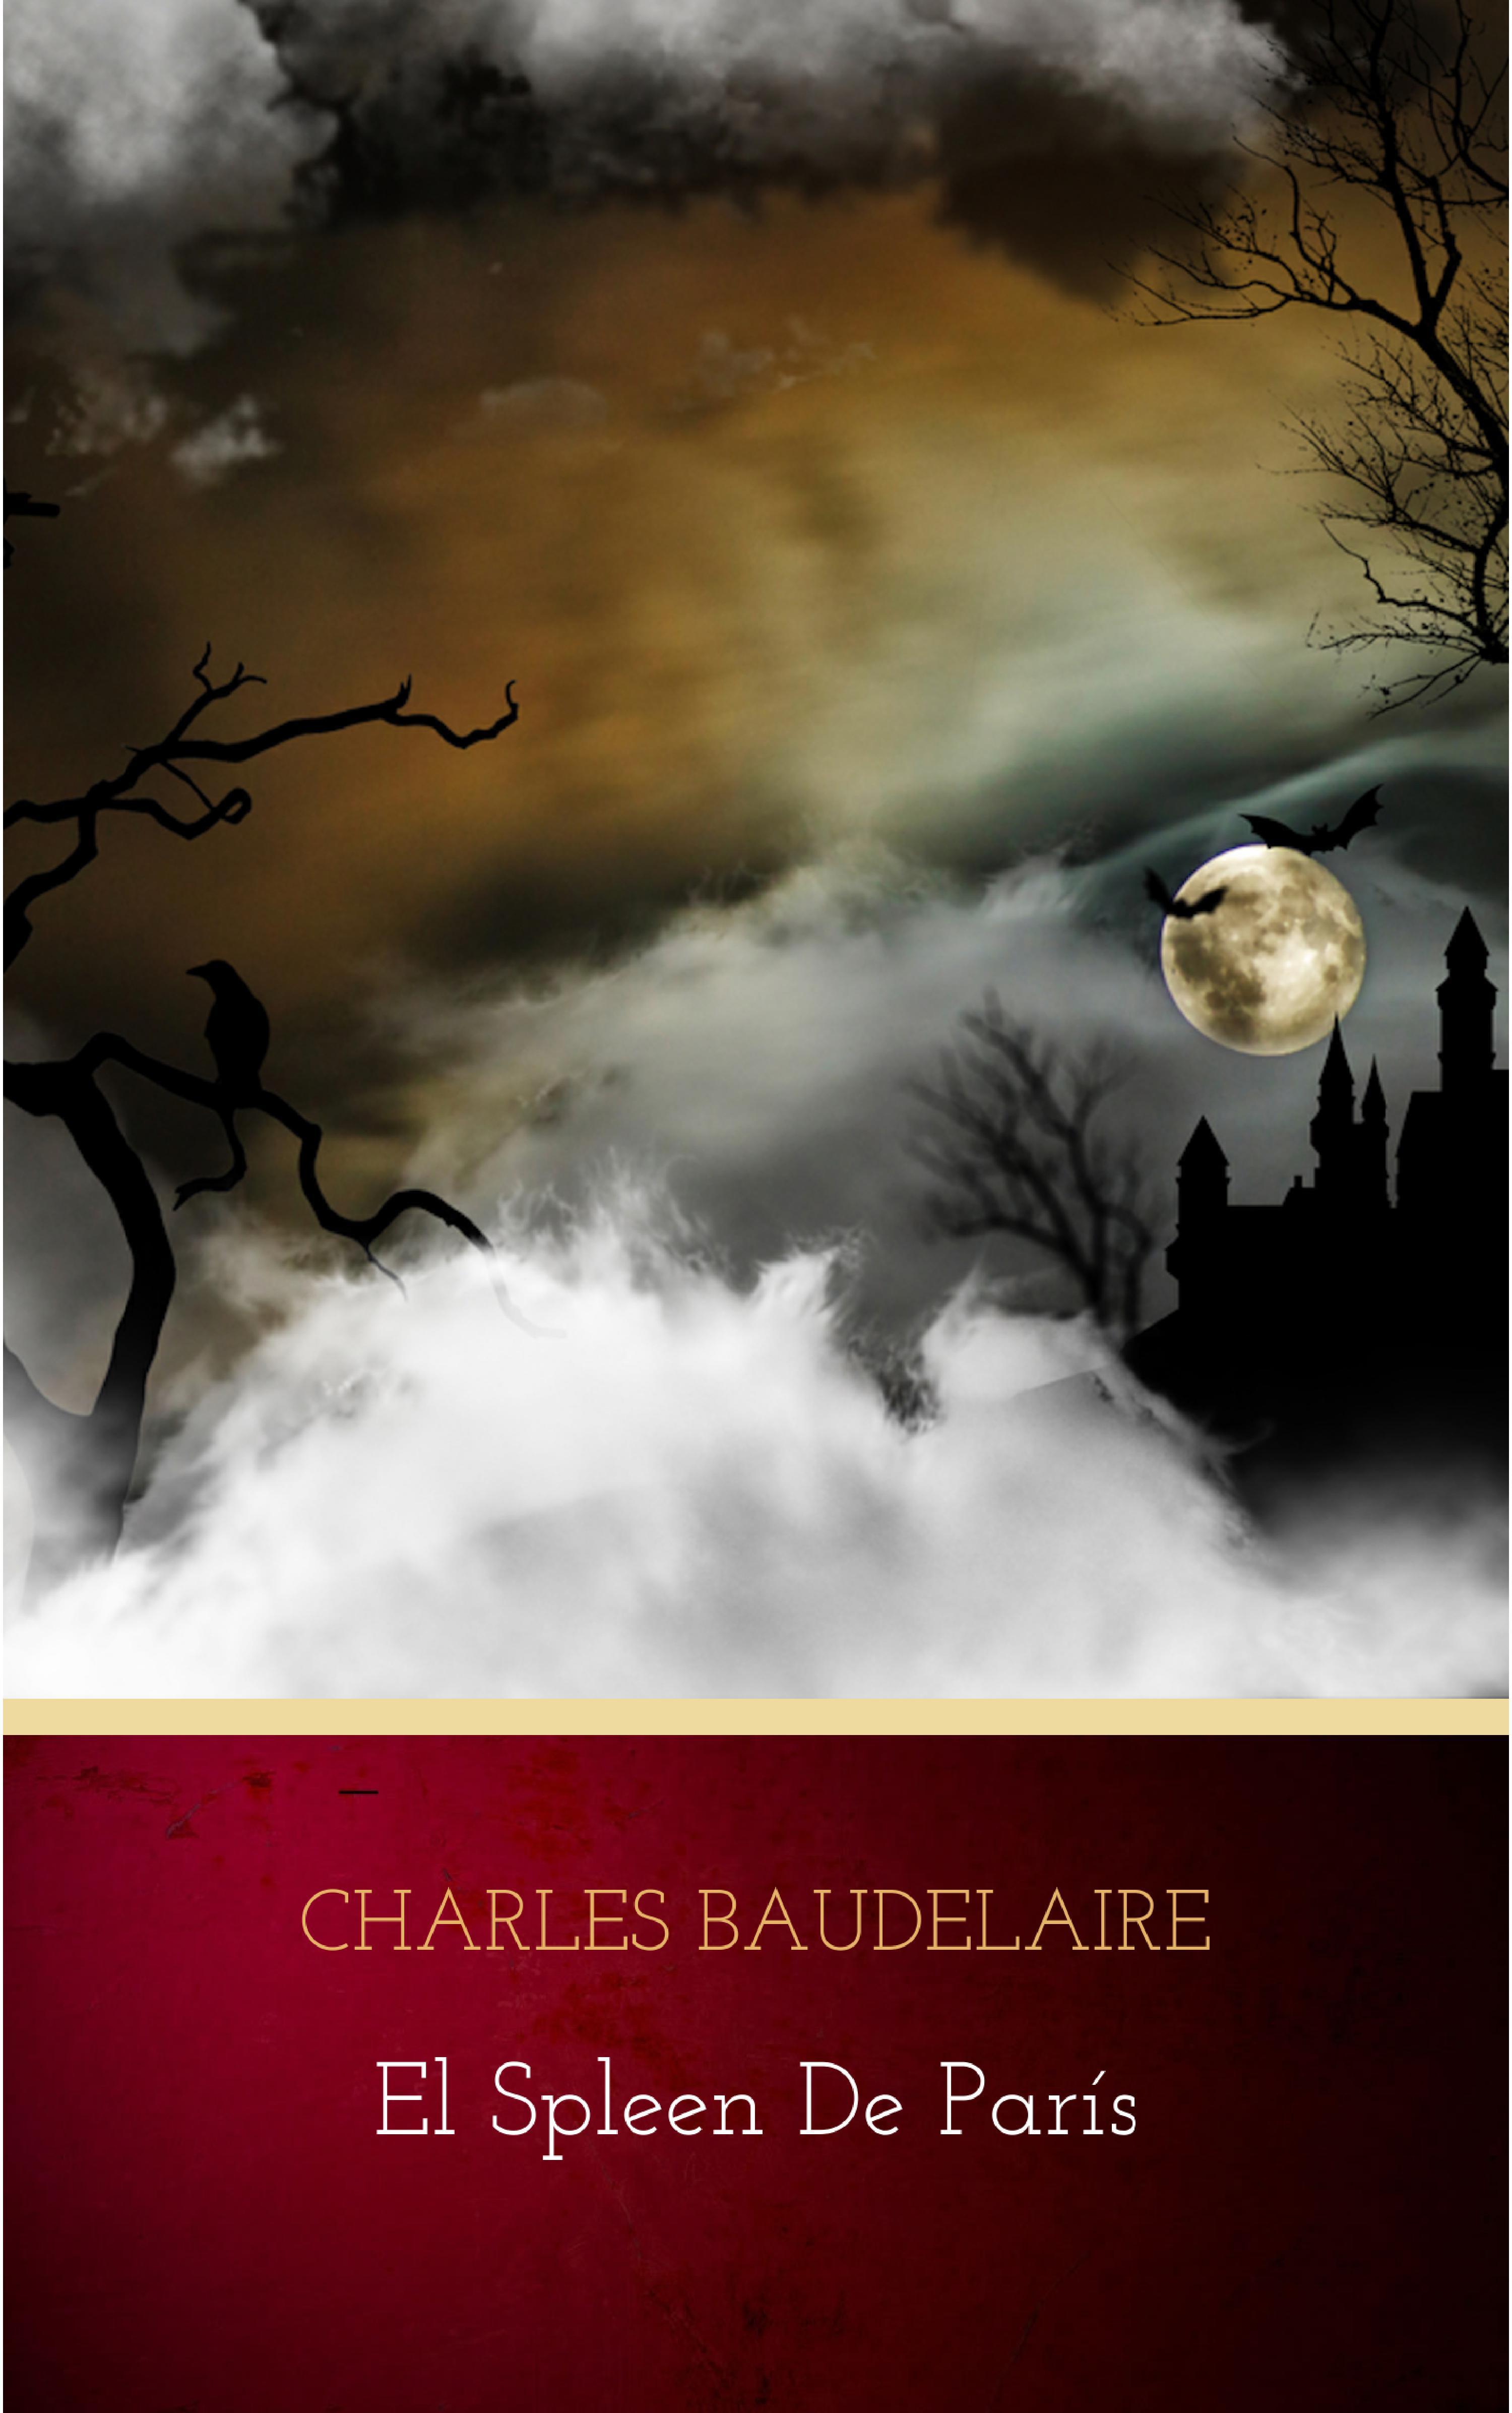 Baudelaire Charles El spleen de París dj natalia parís cali